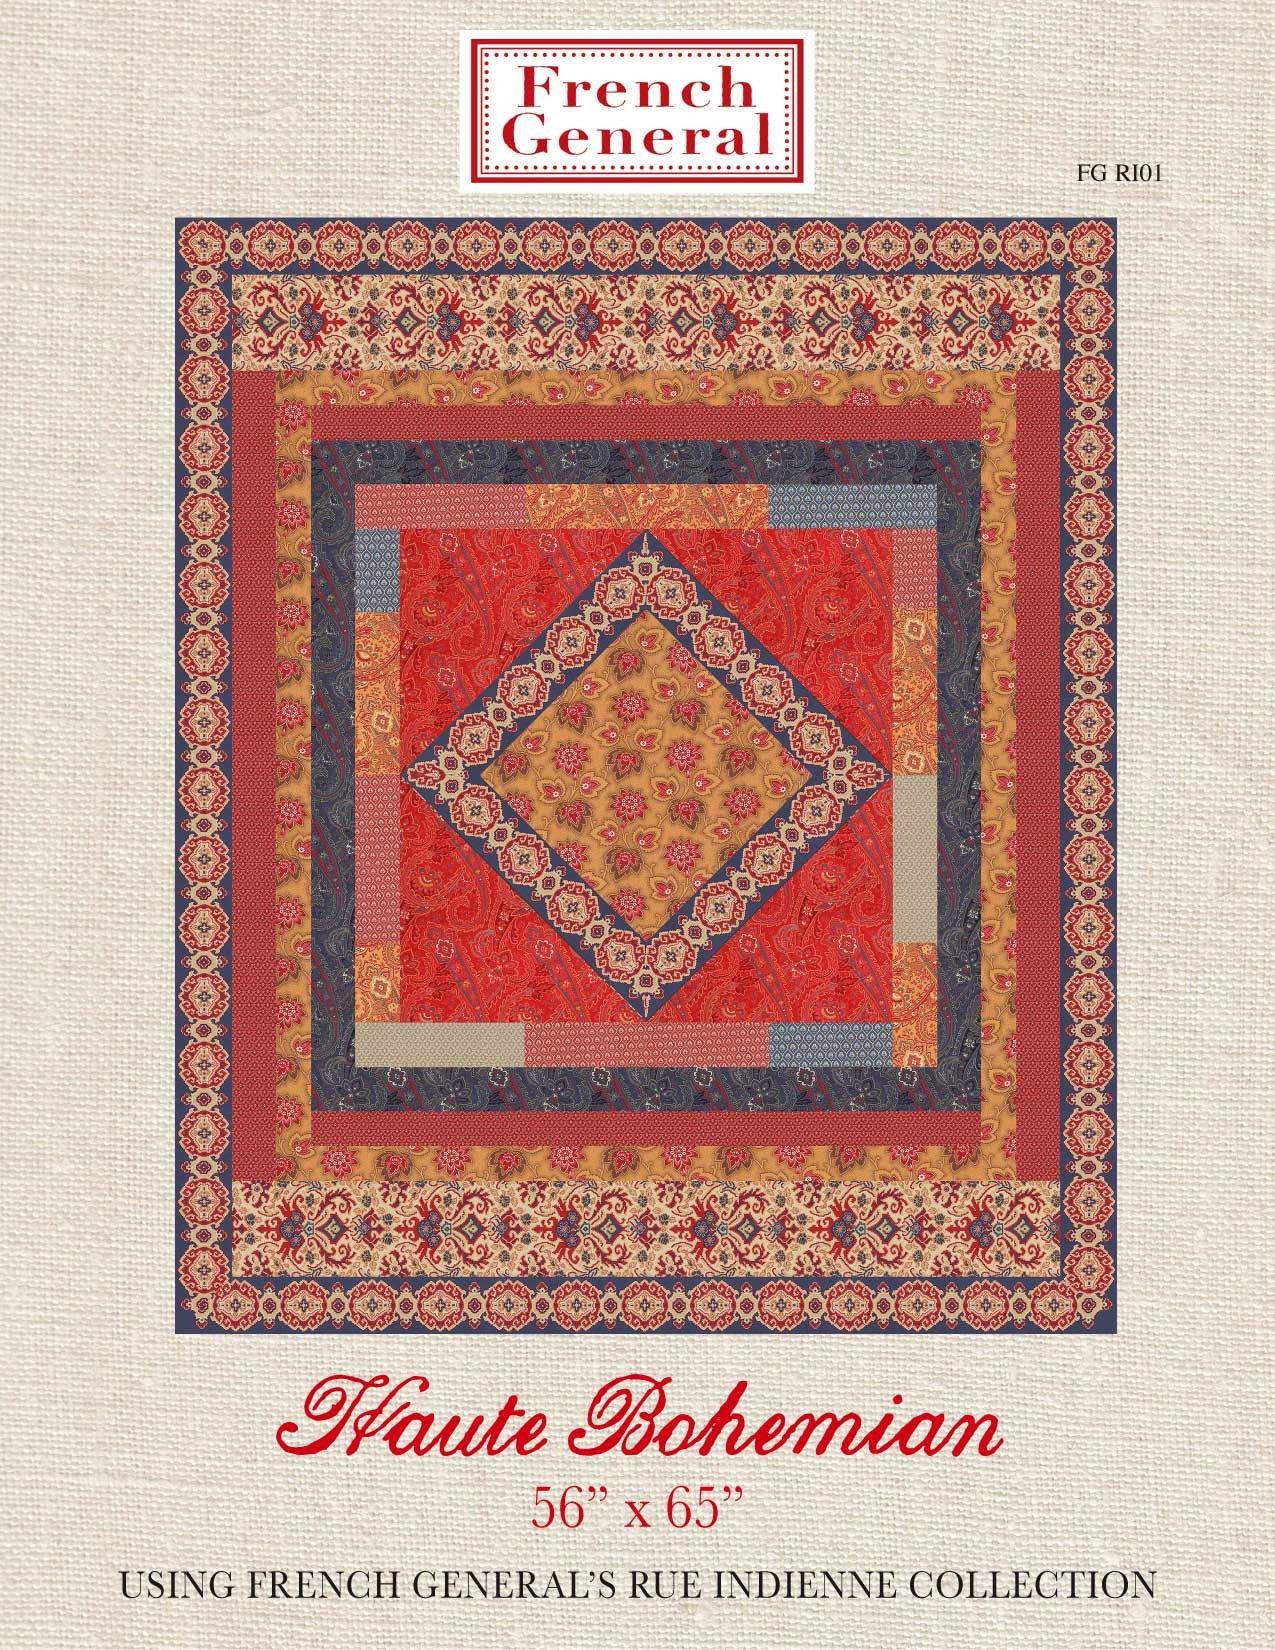 rue indienne haute bohemian quilt pattern